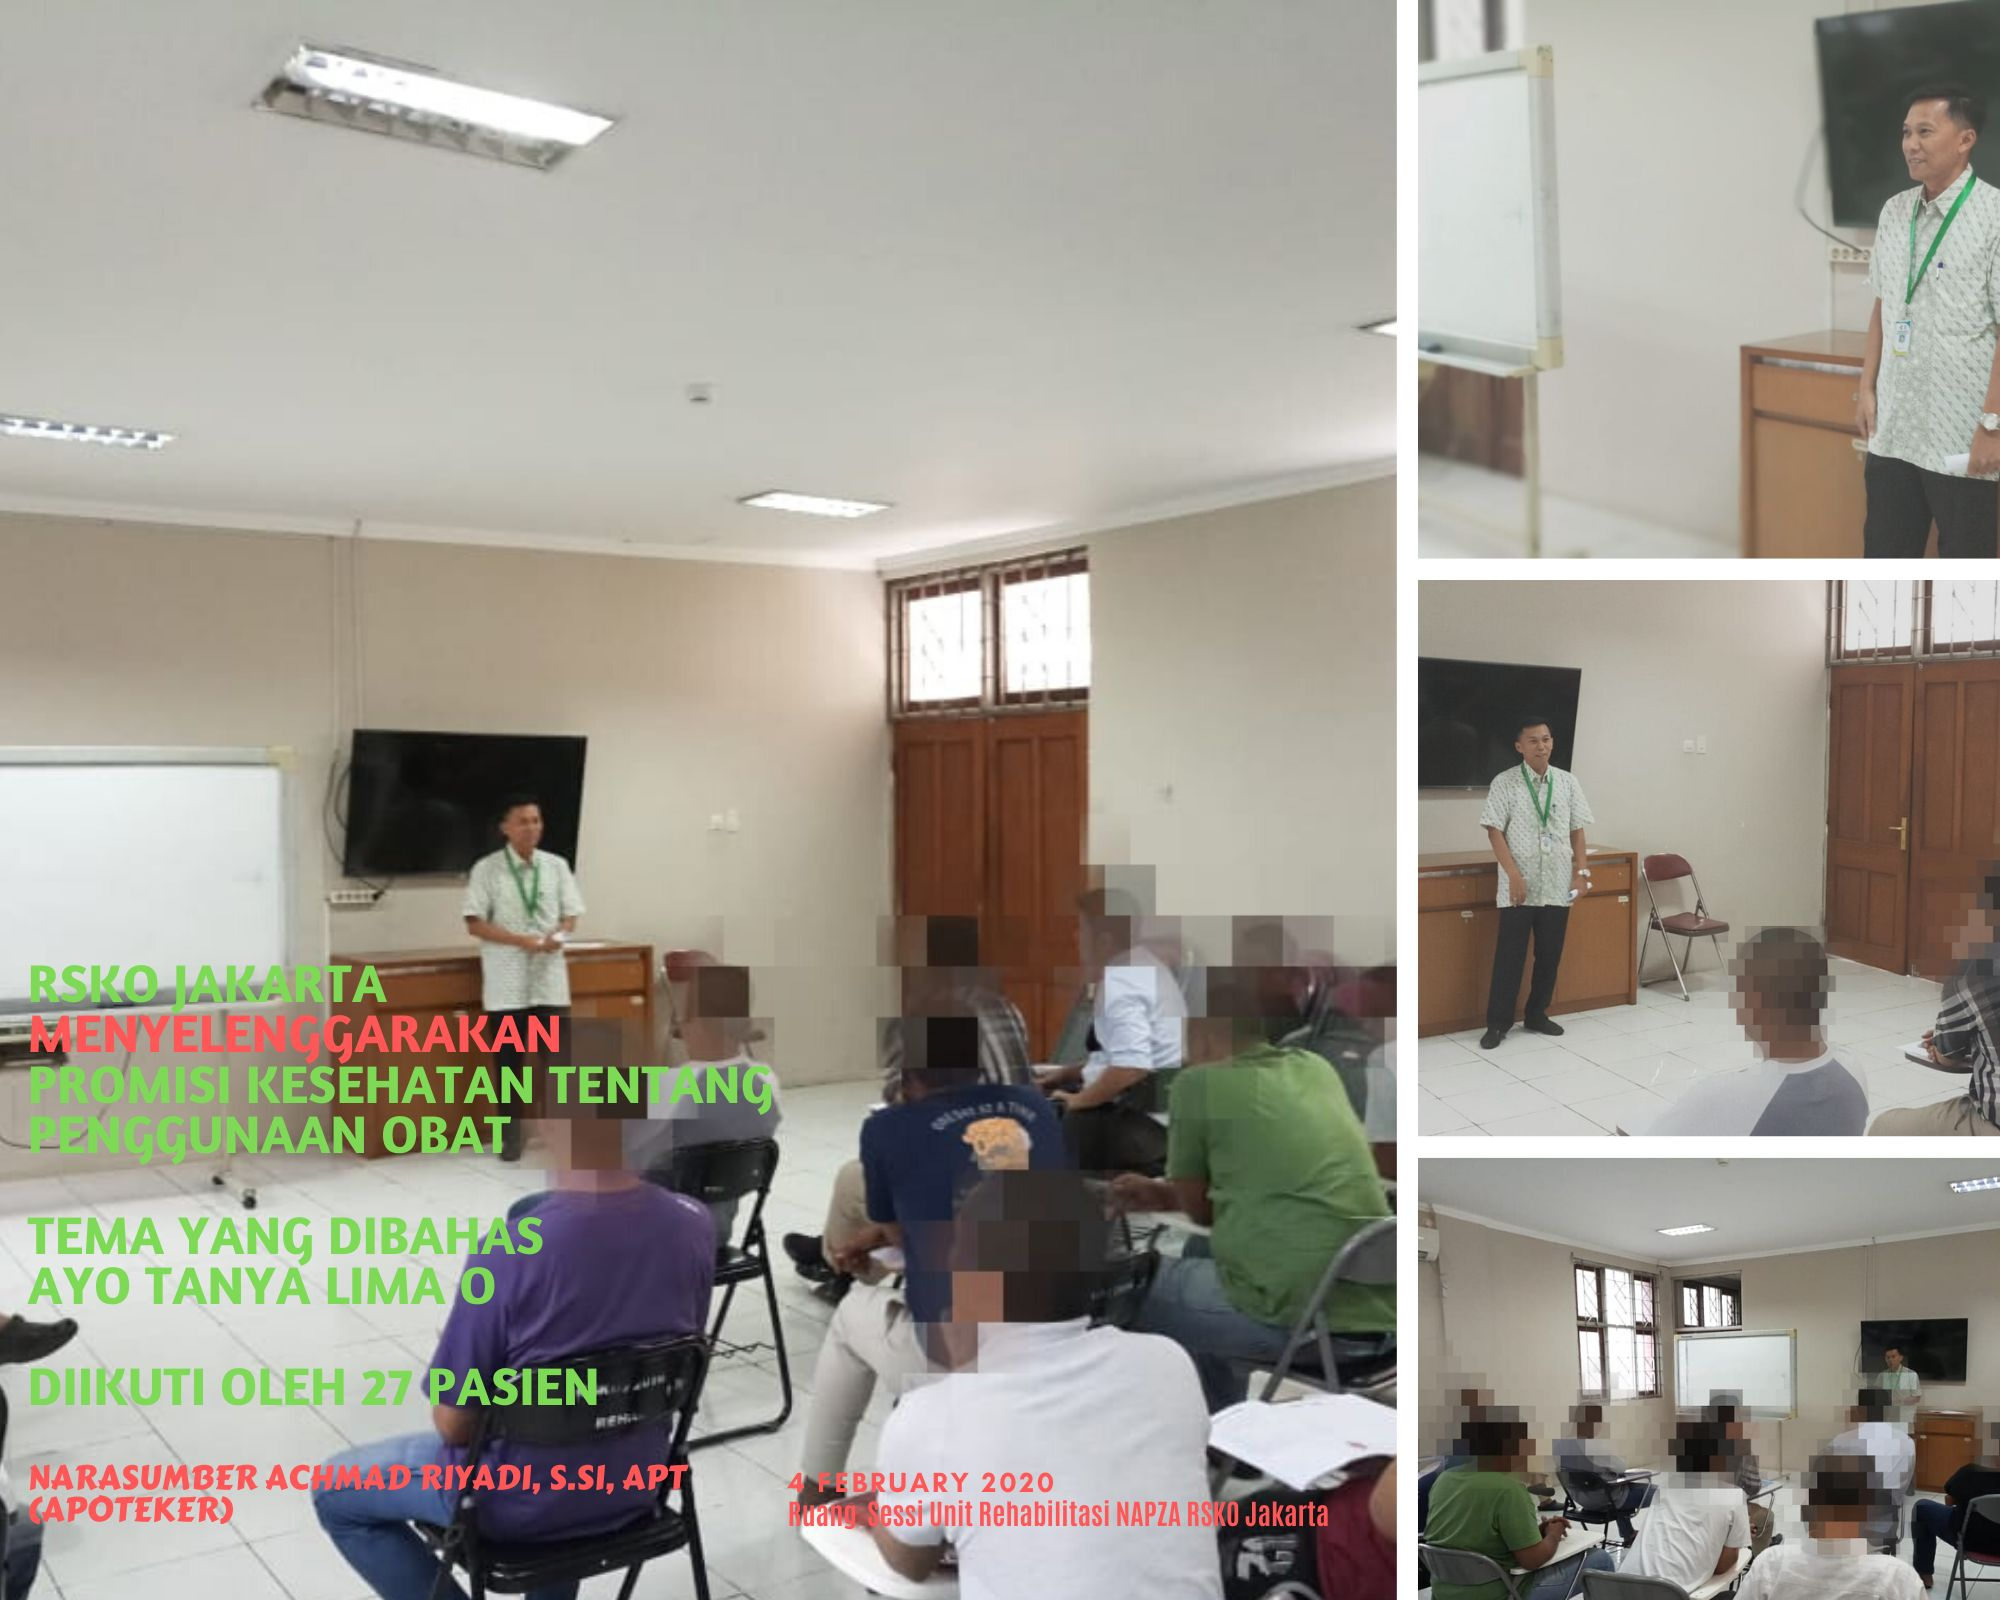 Deskripsi : Profesional Session diadakan rutin setiap hari selasa di RSKO Jakarta I Sumber Foto : dokpri